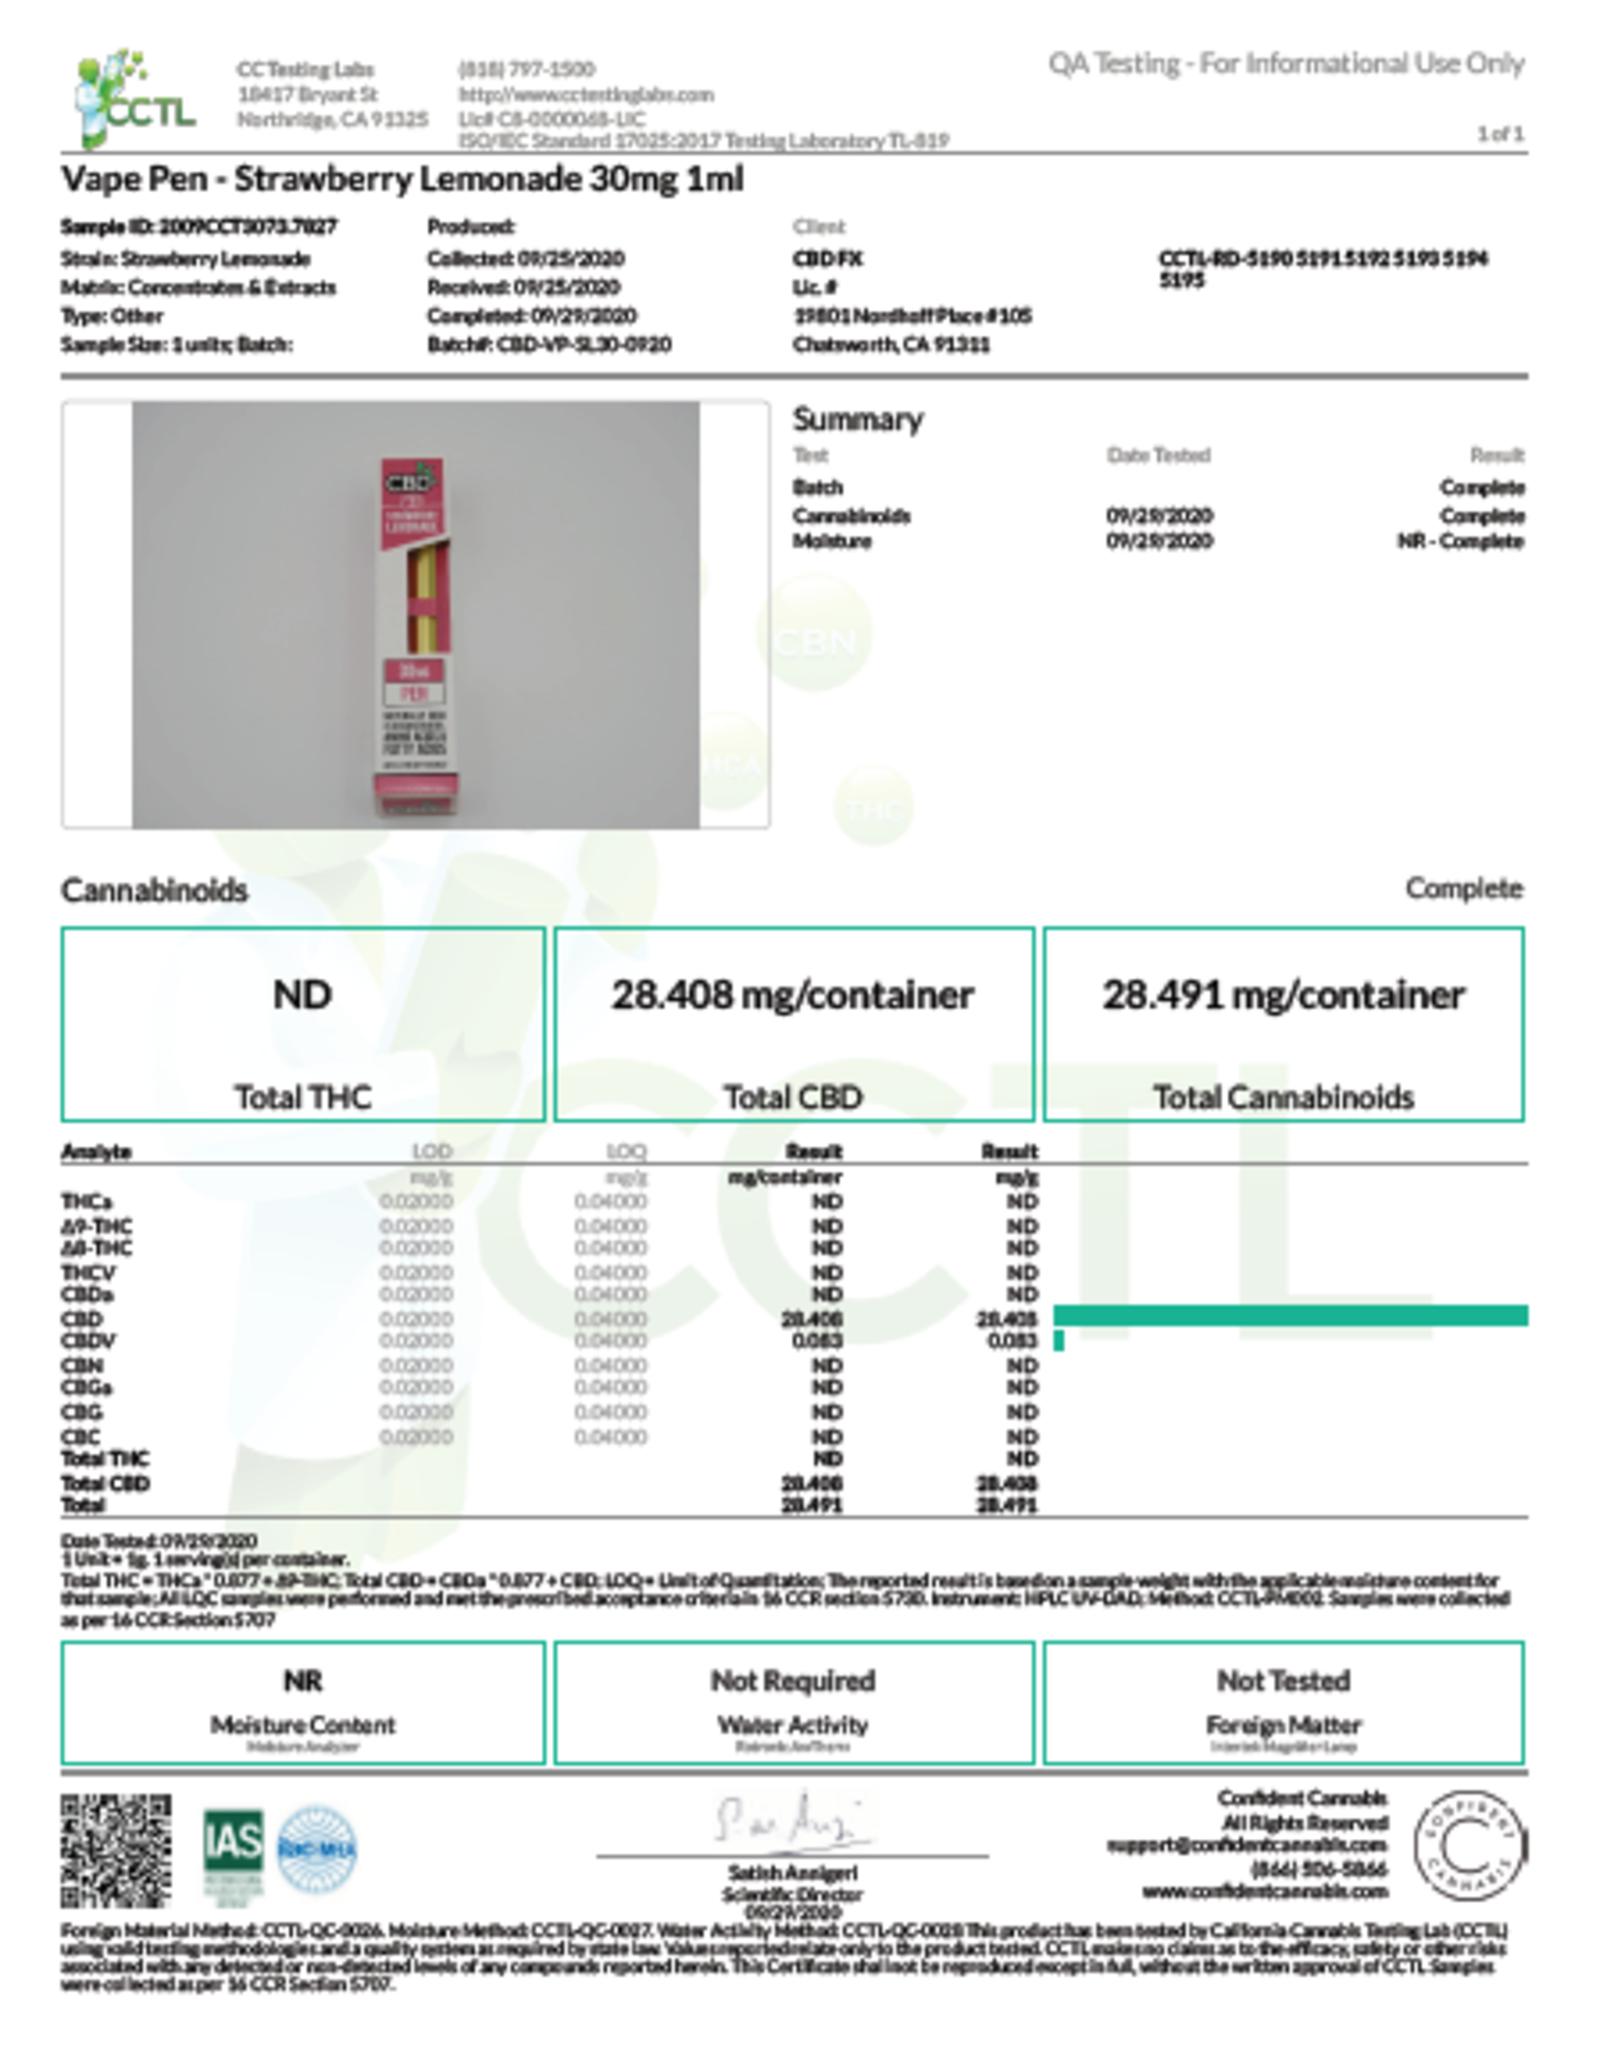 Disposable CBD Vape Pen, Strawberry Lemonade 30mg